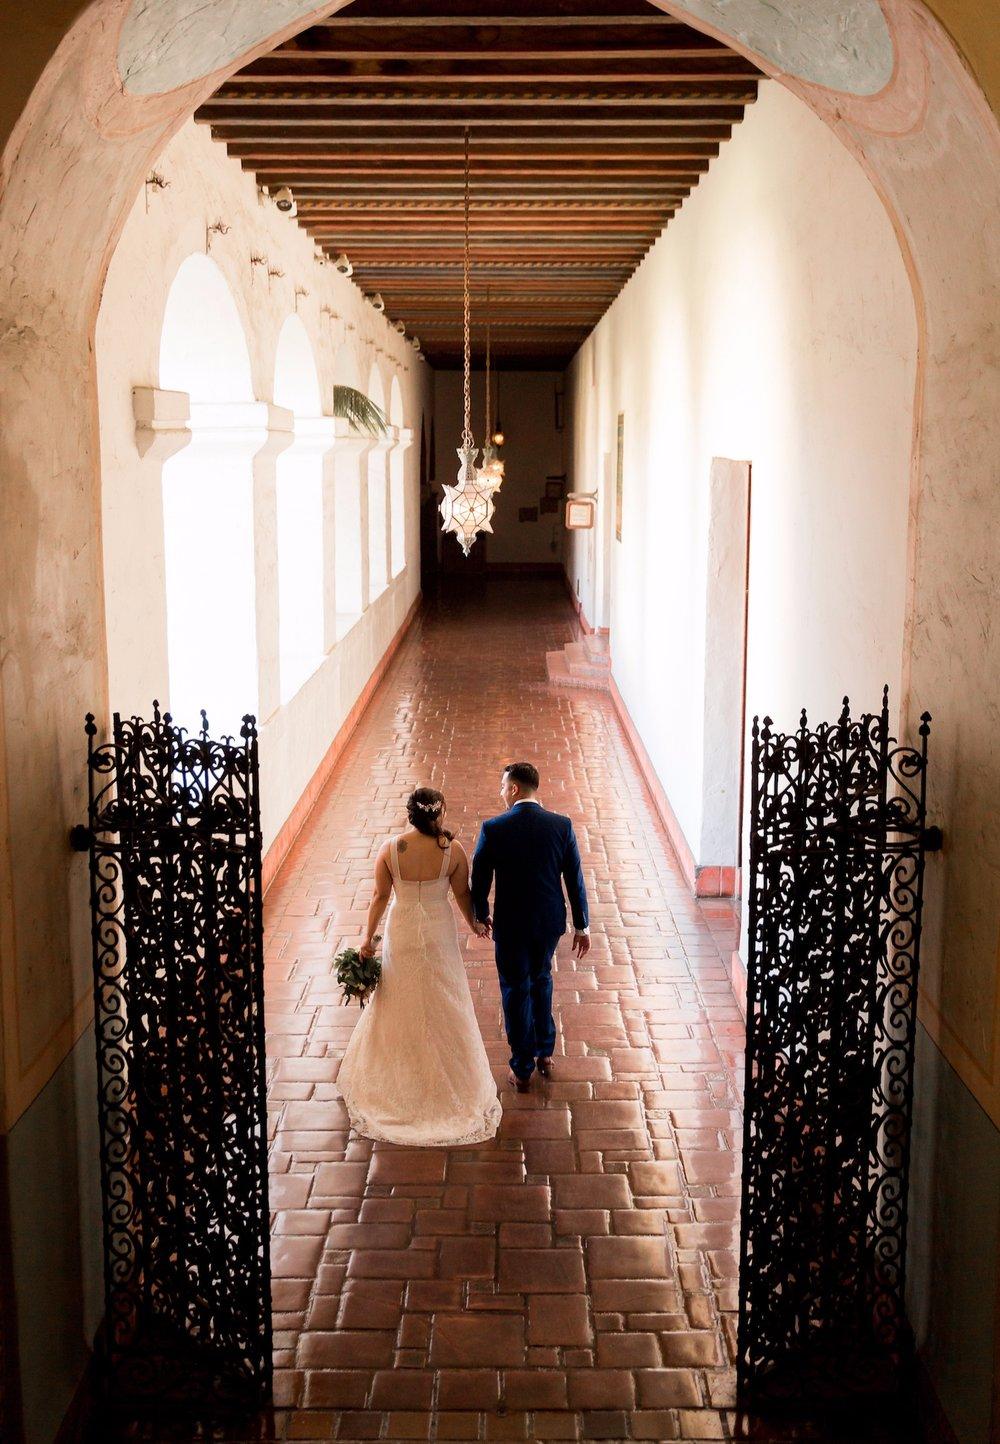 Newlyweds walking down tiled mezzanine